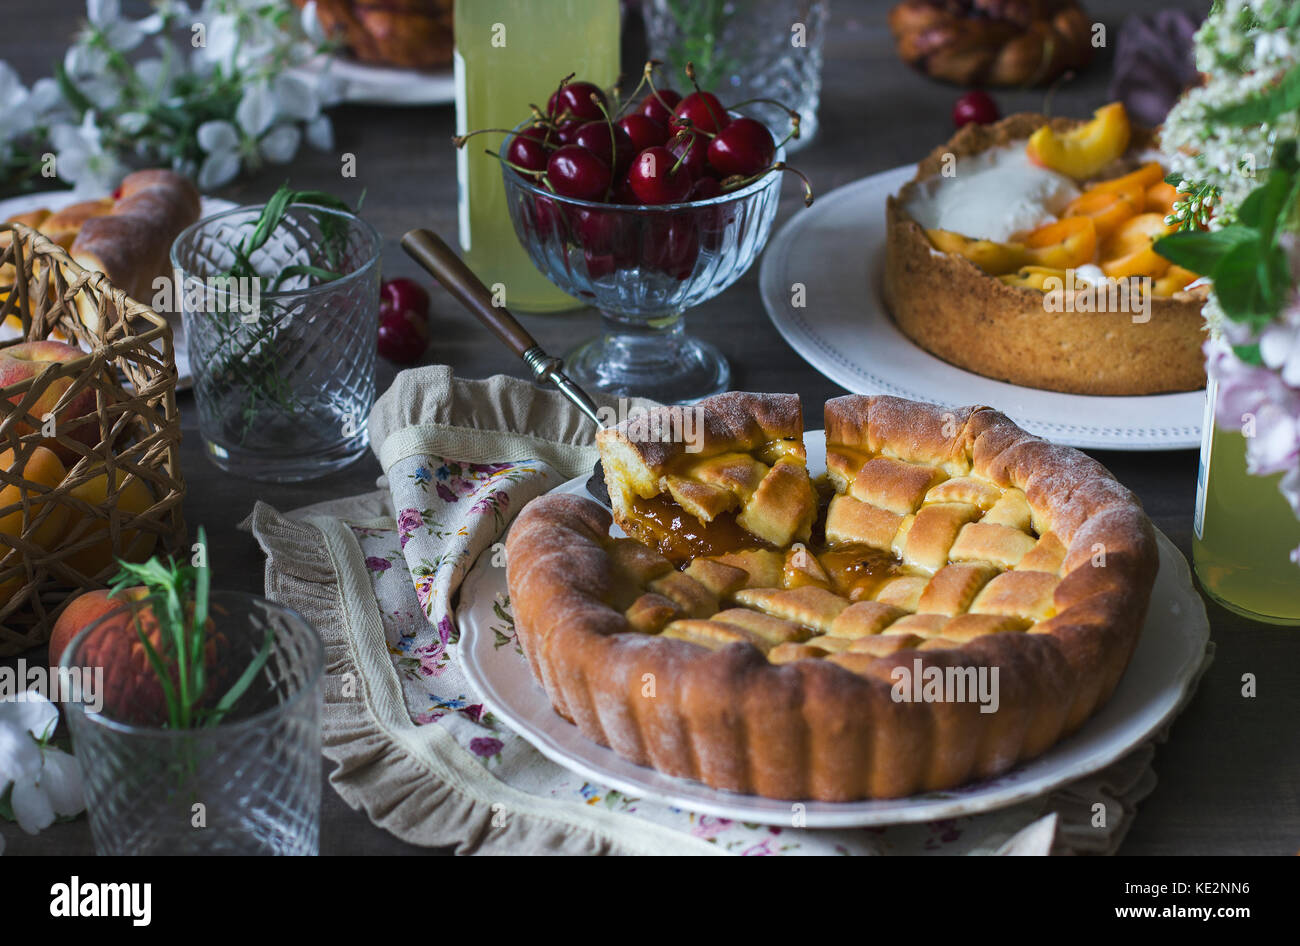 Tarta casera, pasteles y comida sobre la mesa festiva Imagen De Stock